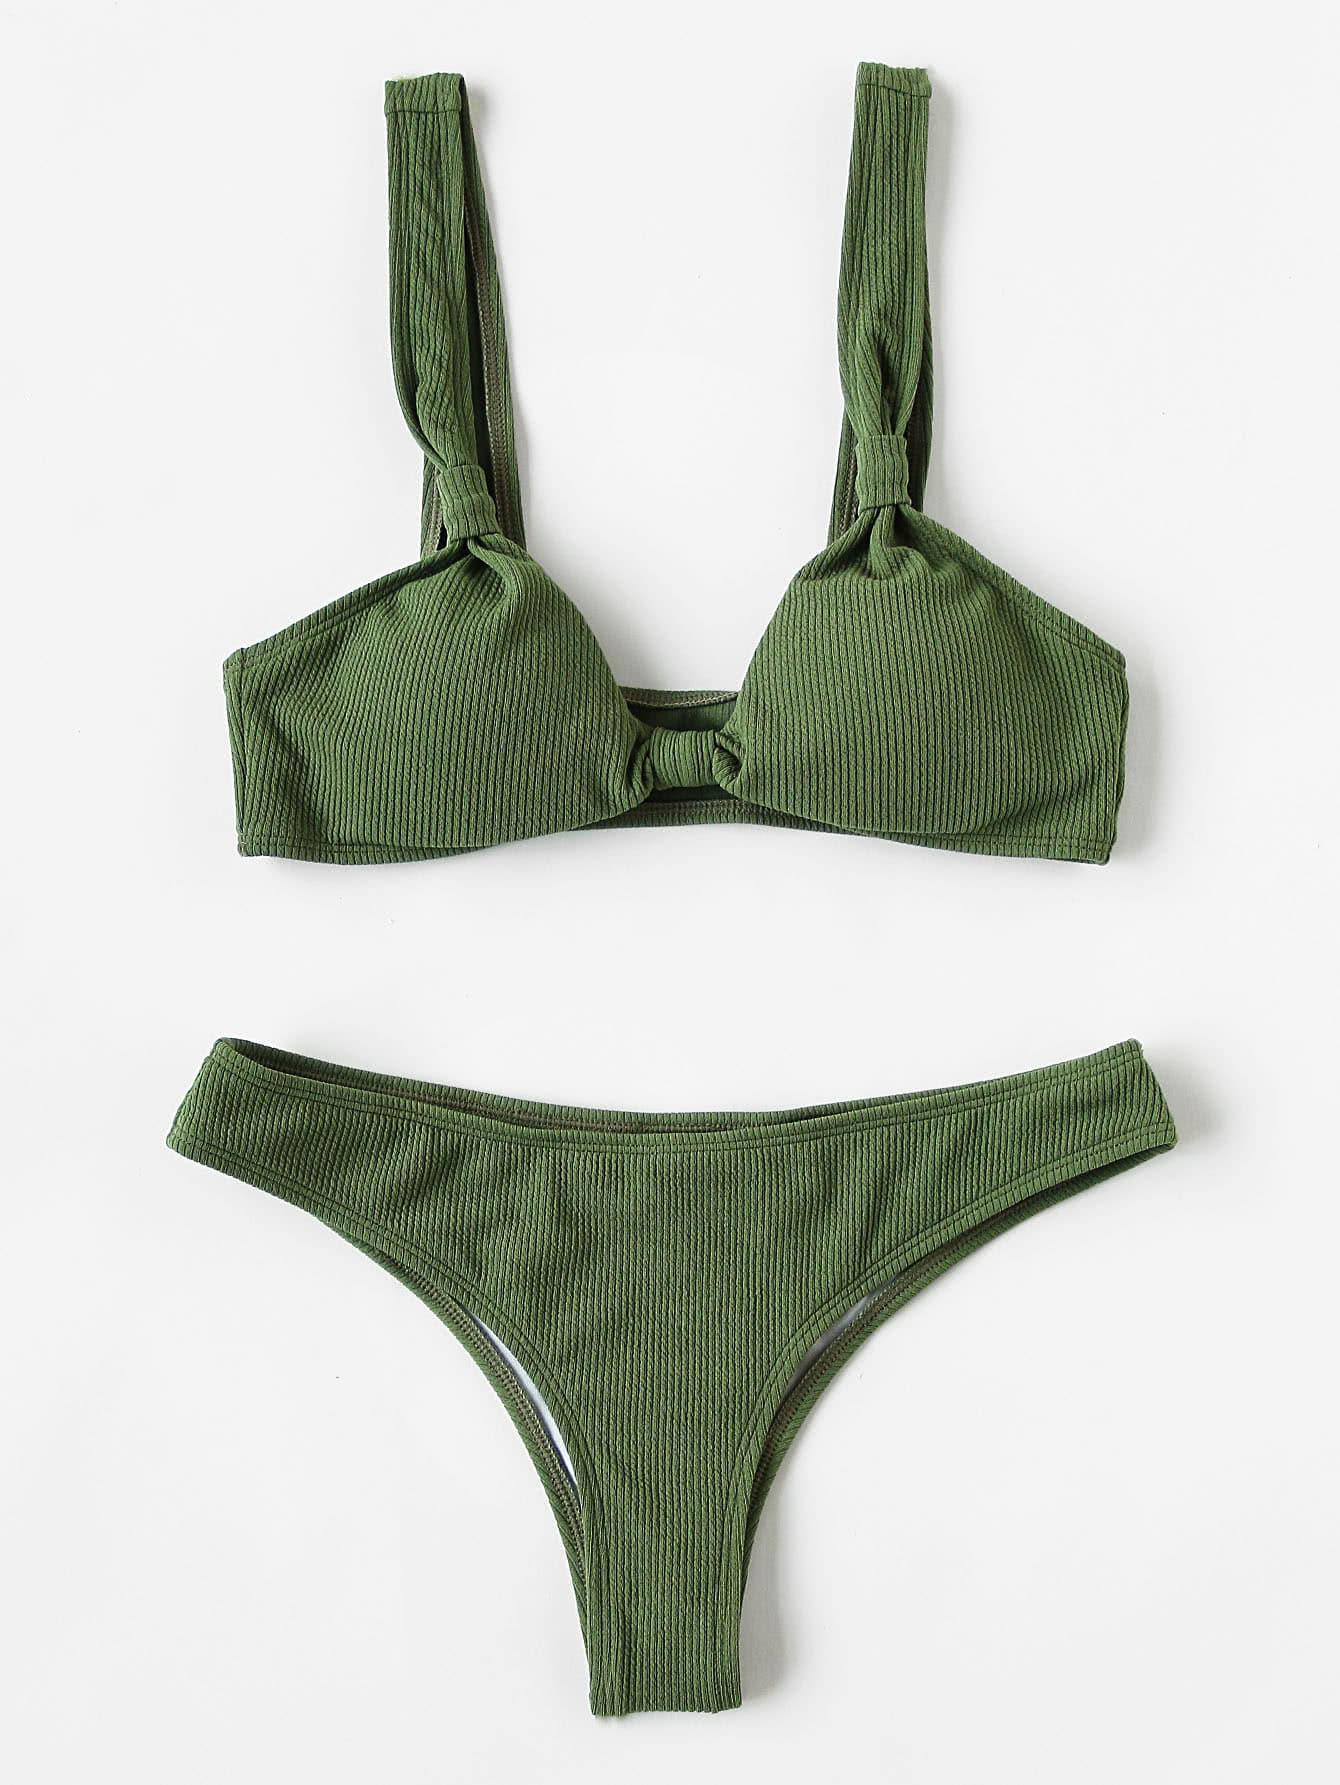 http://us.shein.com/Knot-Detail-Ribbed-Bikini-Set-p-364367-cat-1866.html?aff_id=4021